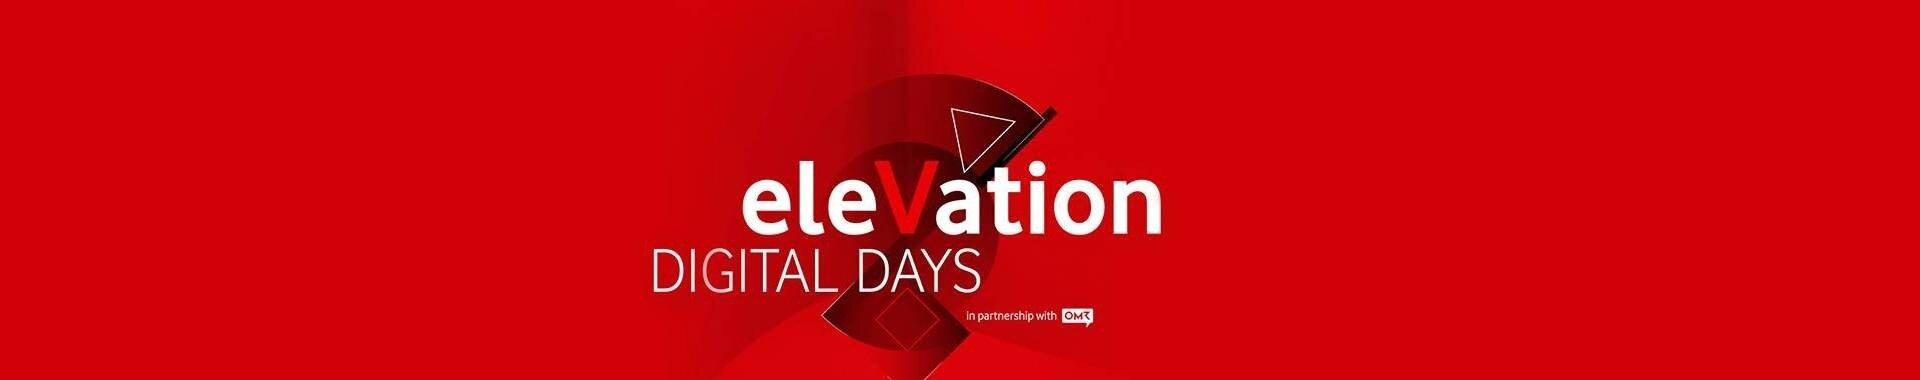 Vodafone Business Global eleVation Digital Days Etkinliği